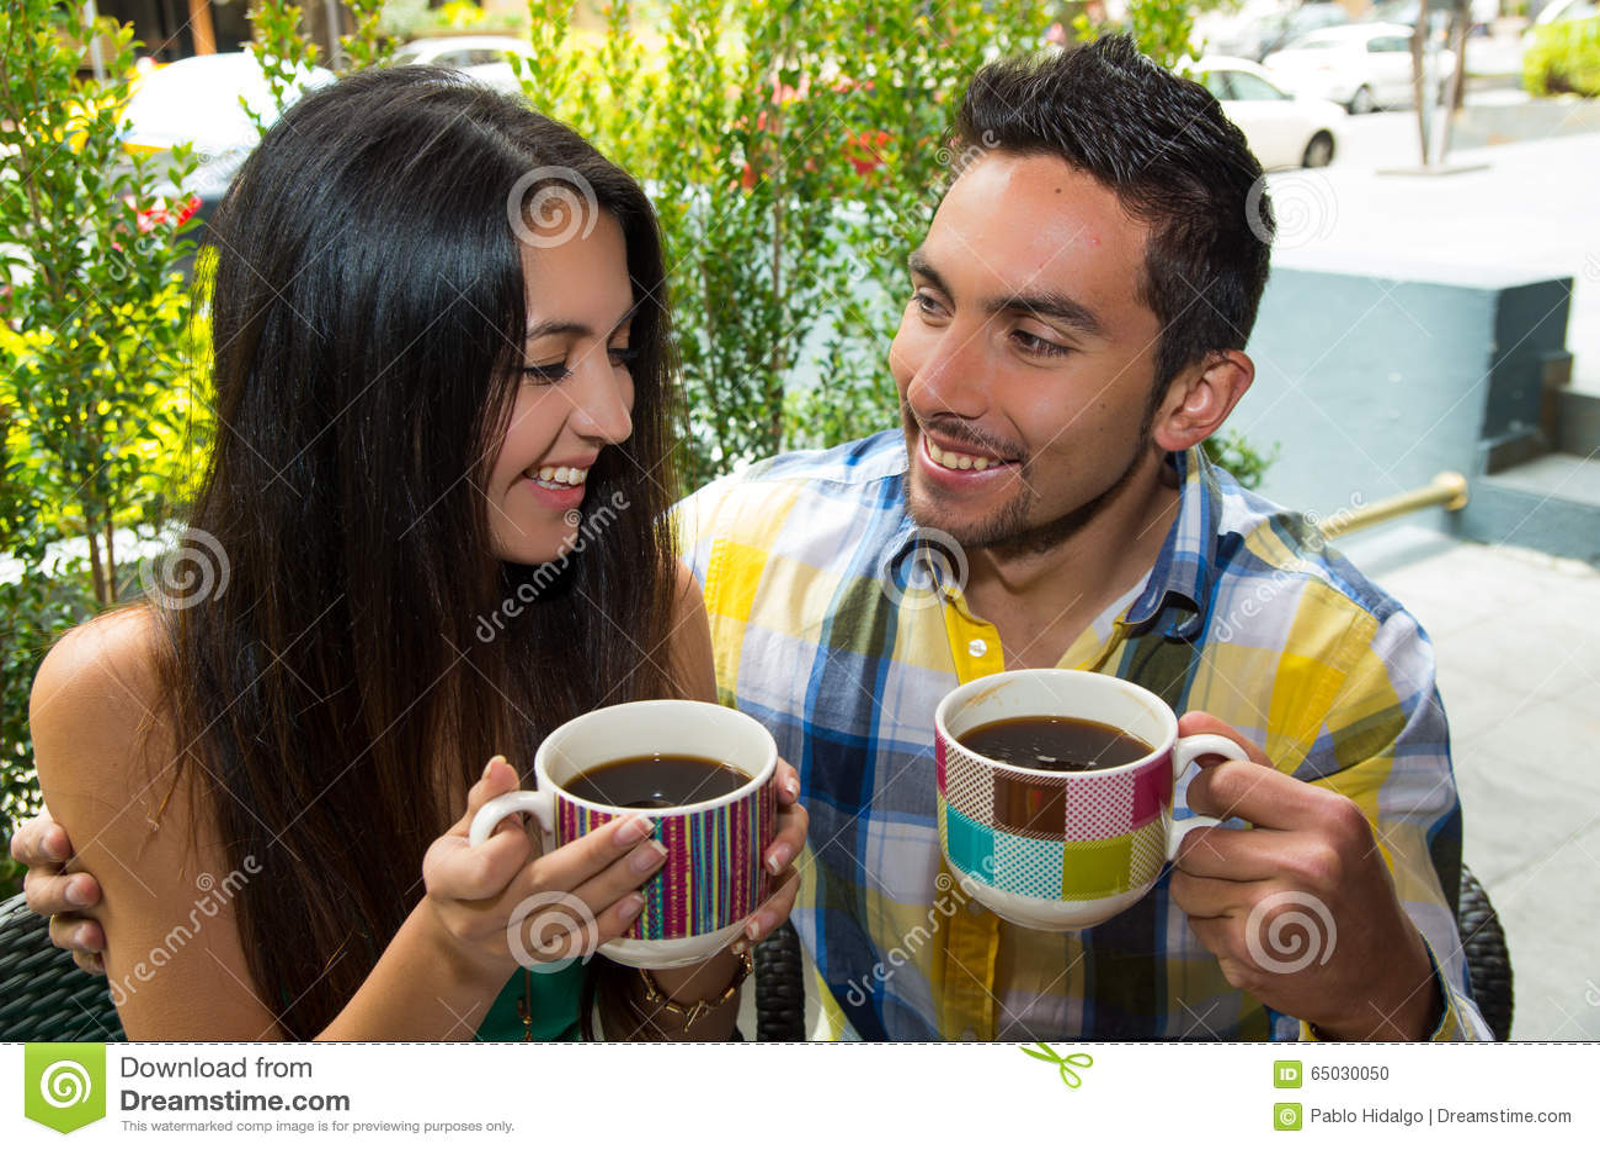 how to date a hispanic girl